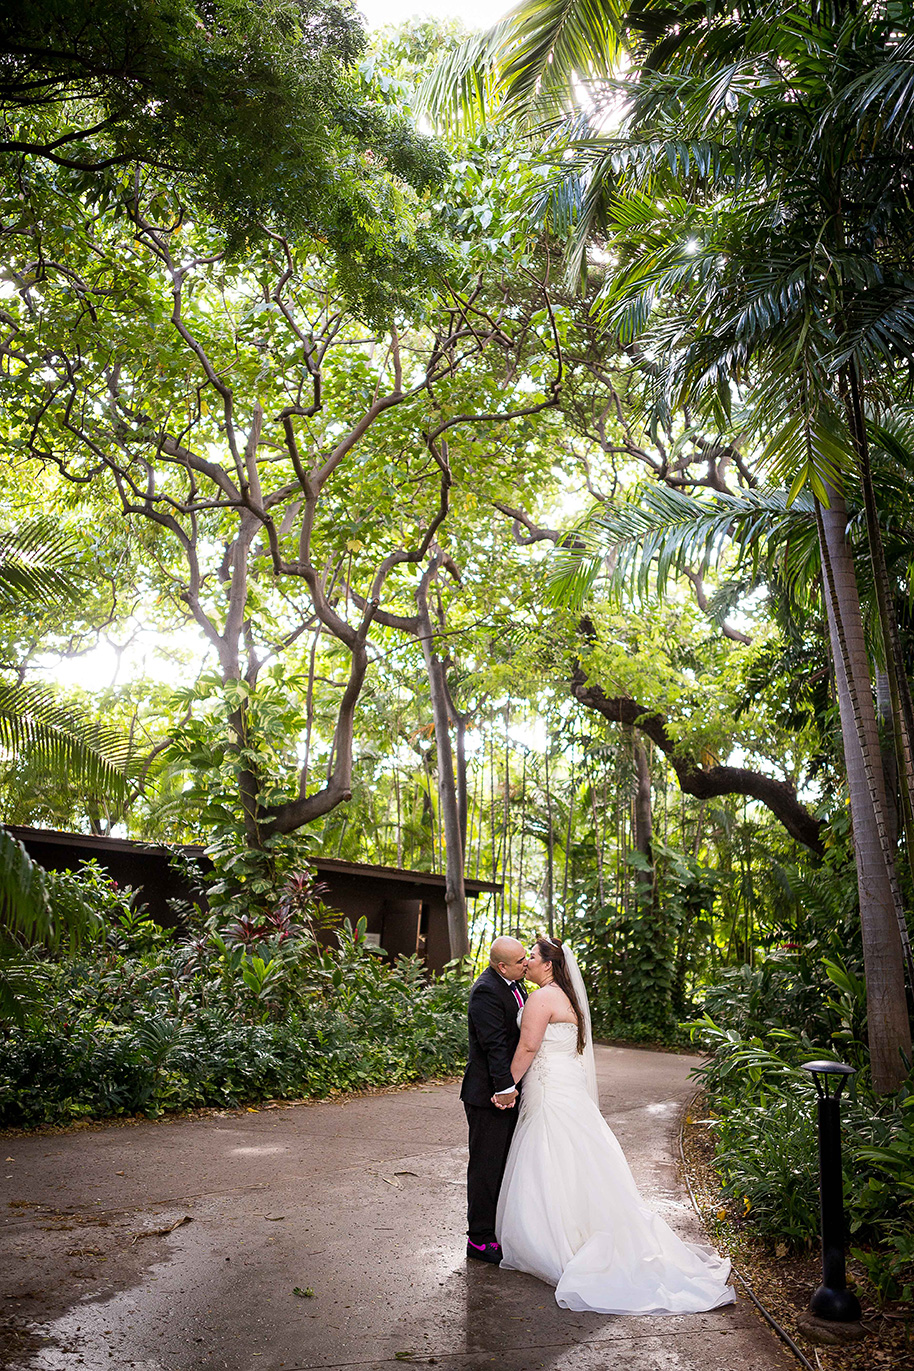 Star-Wars-Wedding-040116-30